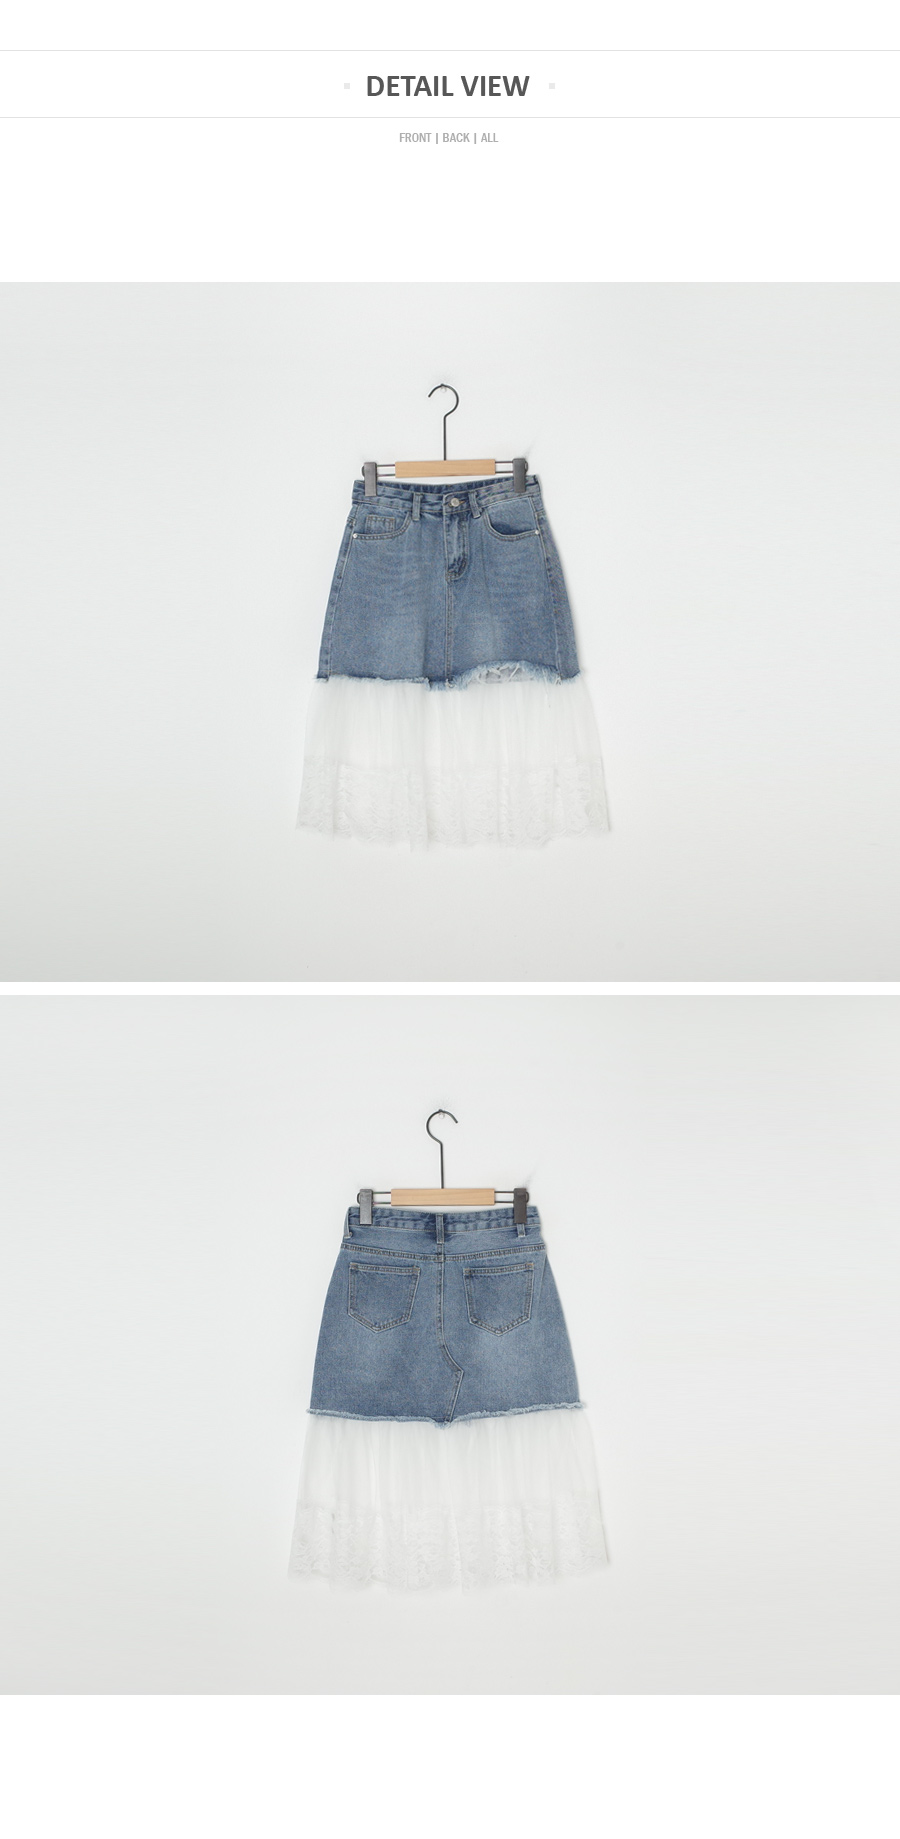 Dress up lace skirt